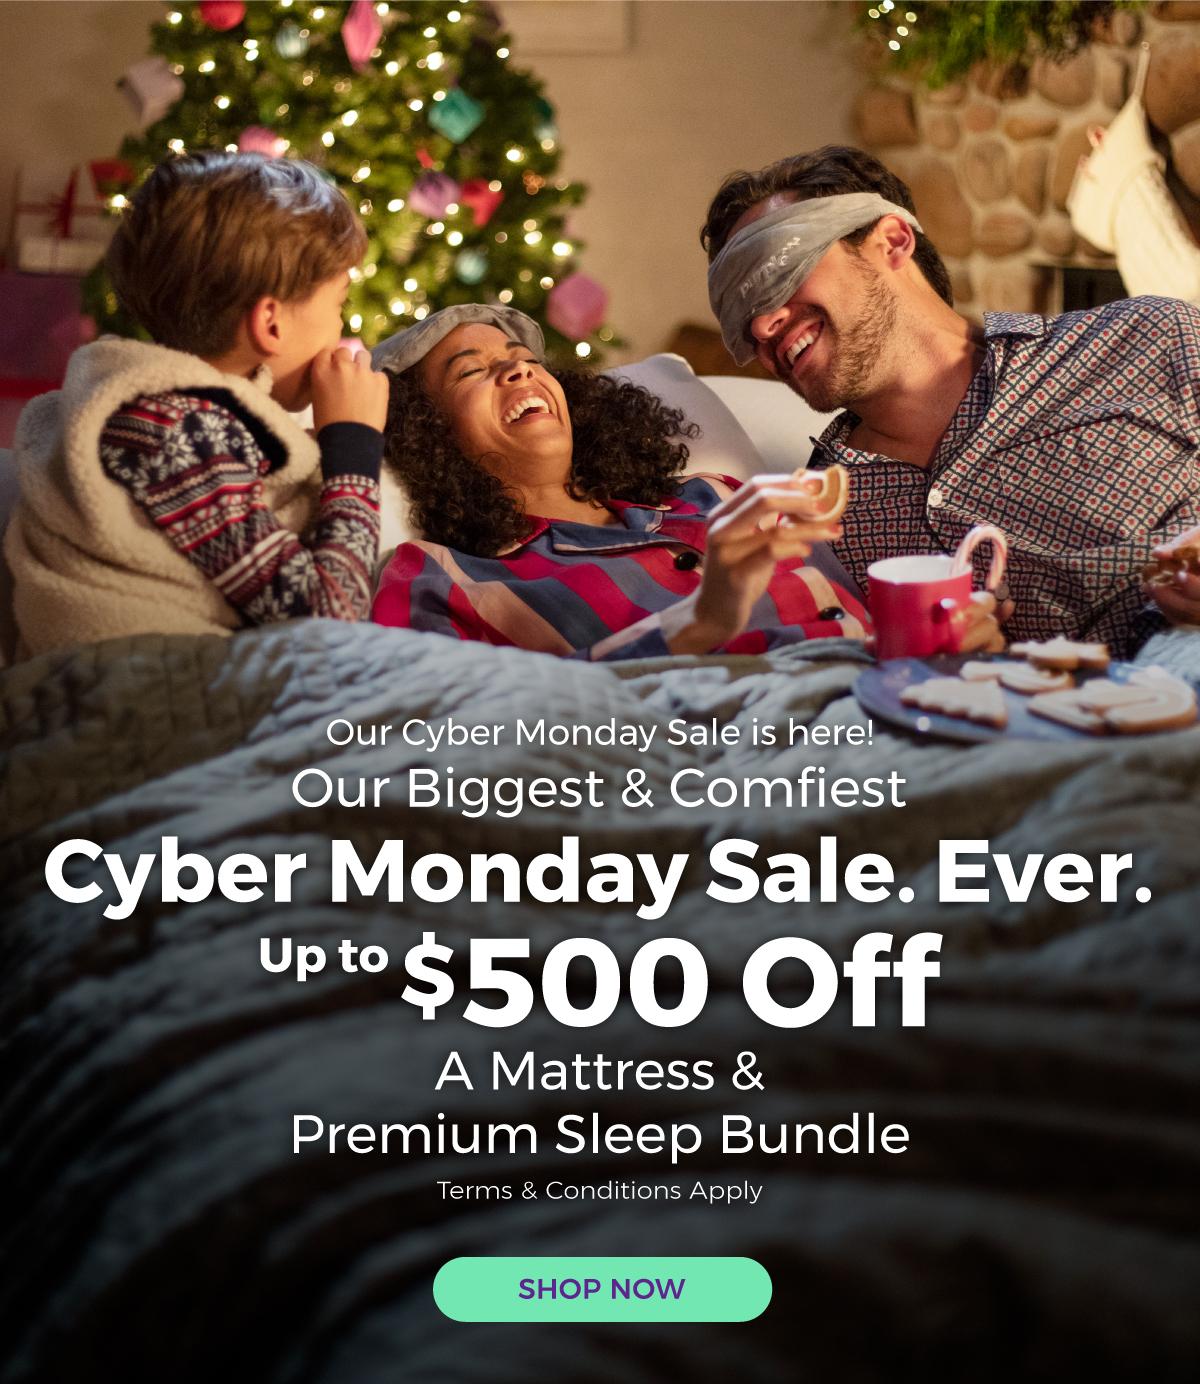 Purple Cyber Monday Sale *UP TO* $500 When You Purchase Mattress & Sleep Bundle - YMMV